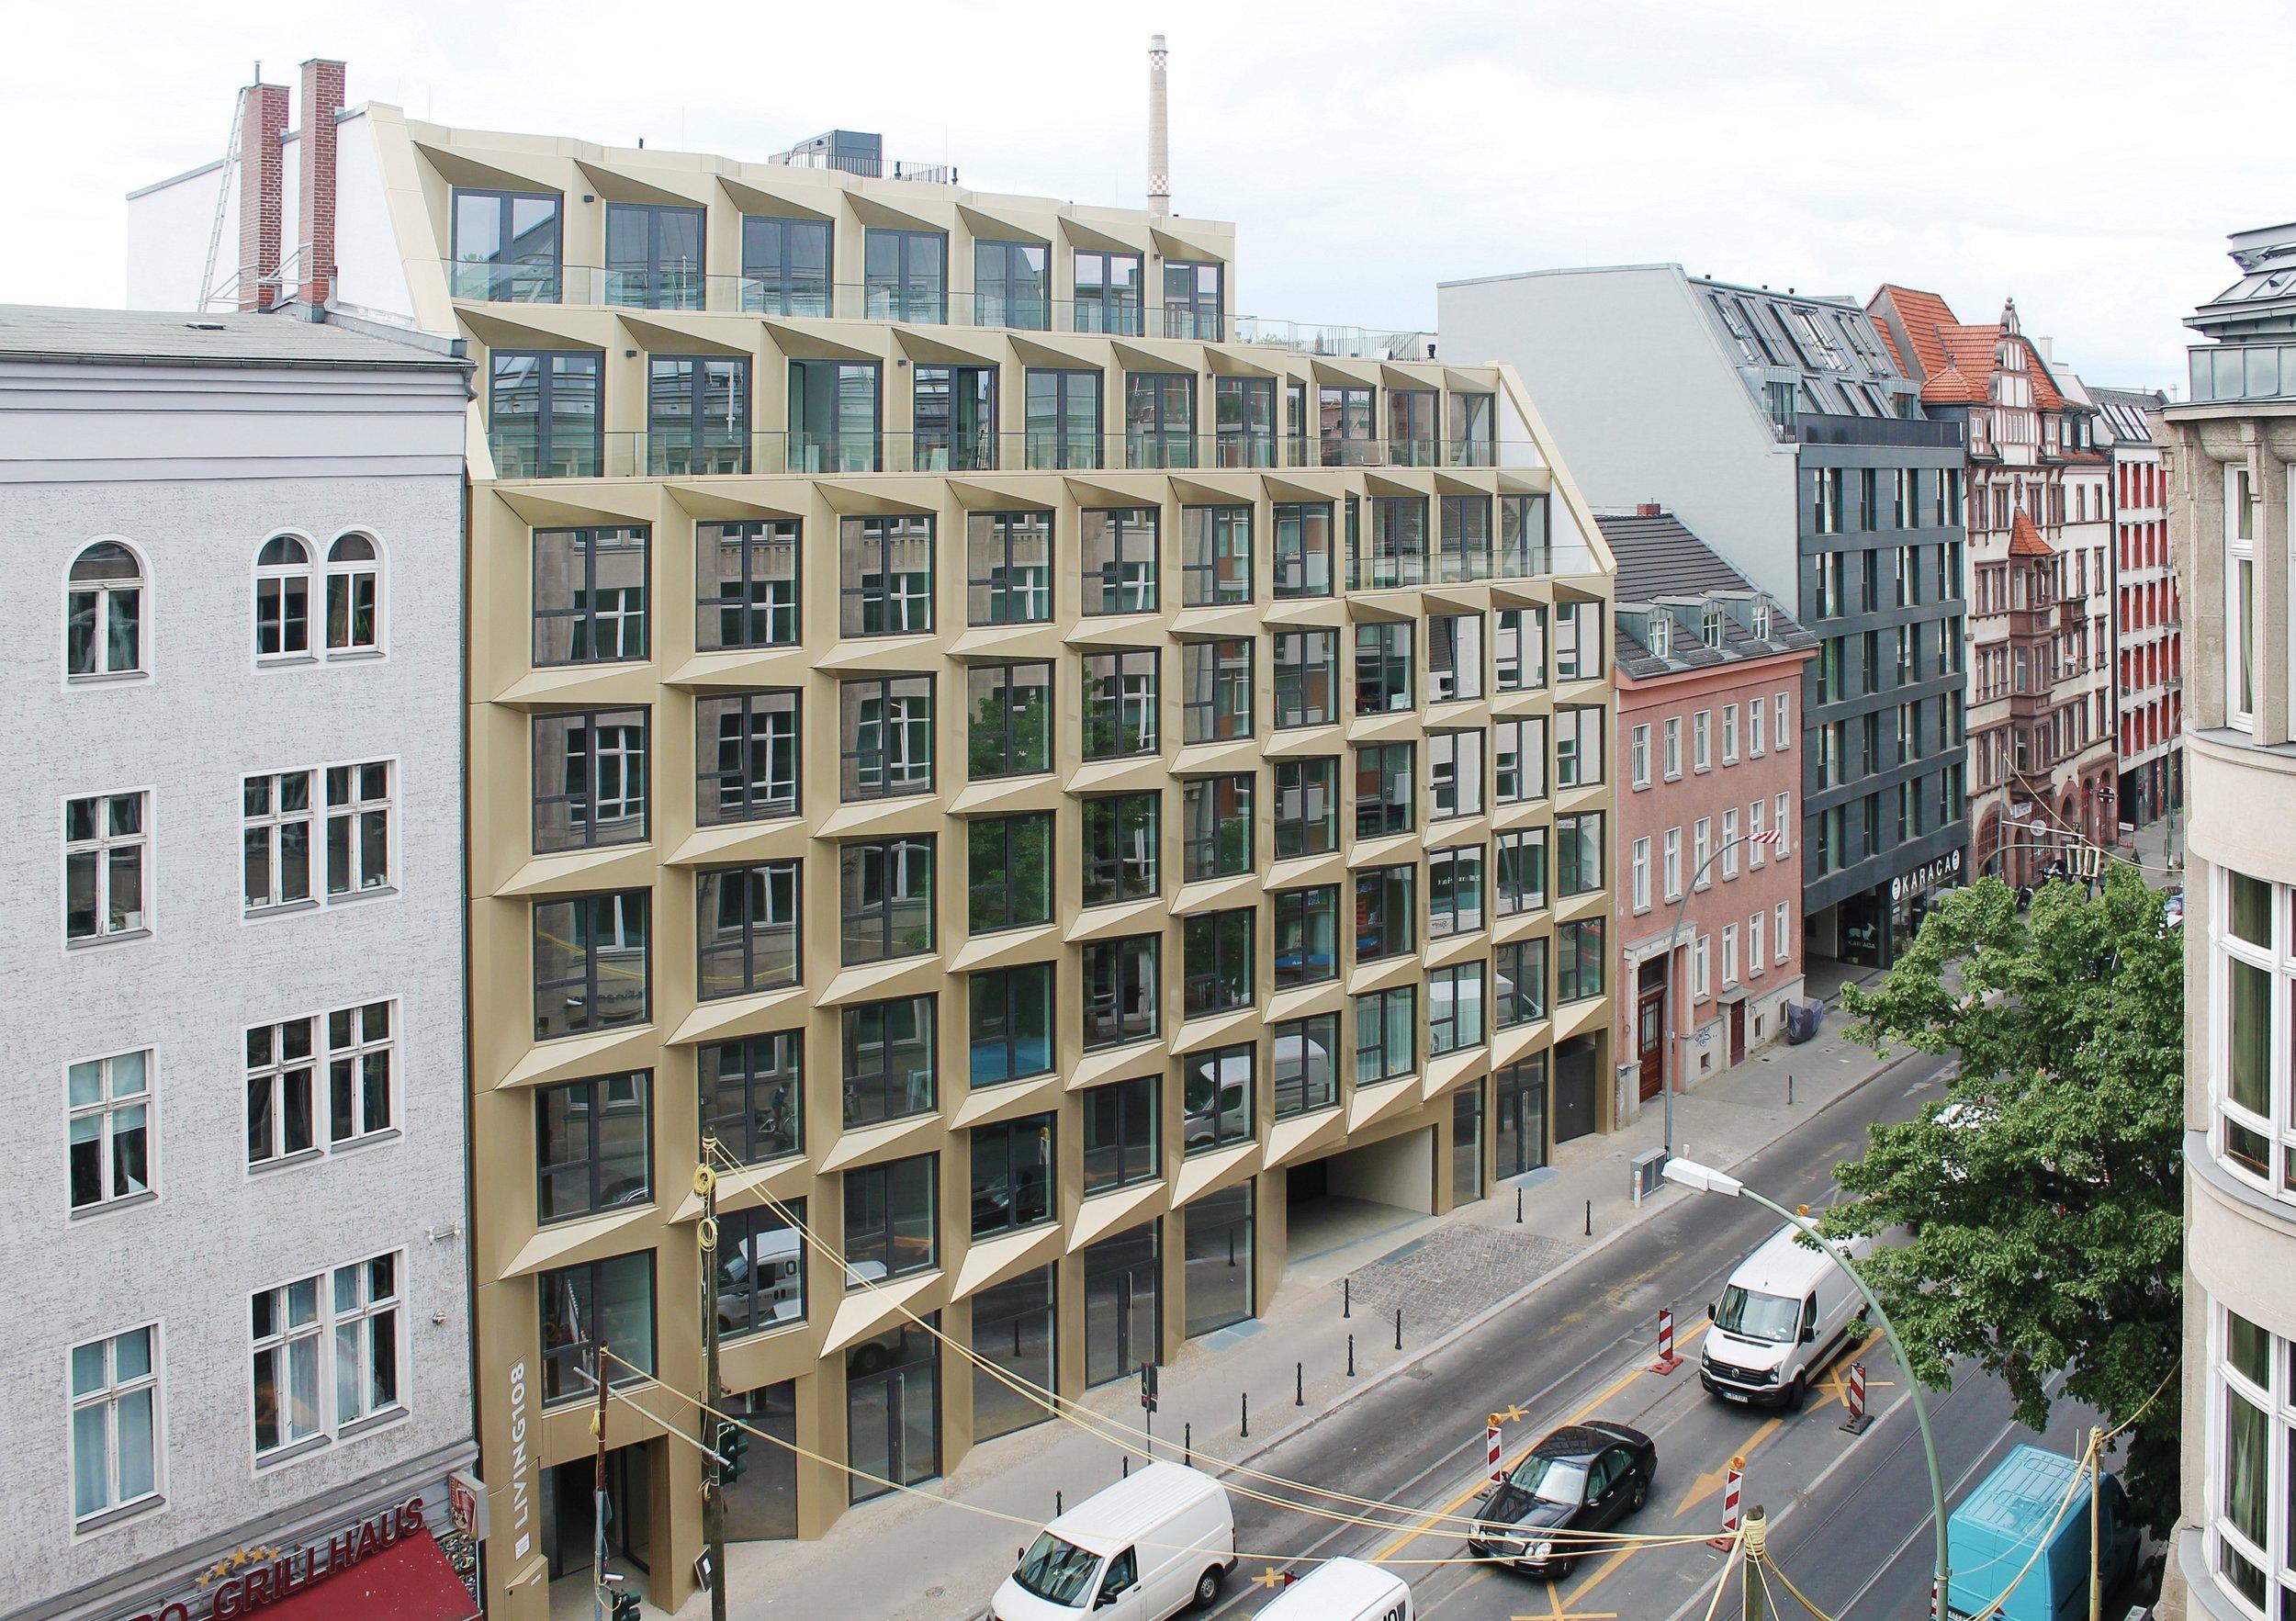 Living 108, Berlin / Axthelm Architekten, Potsdam